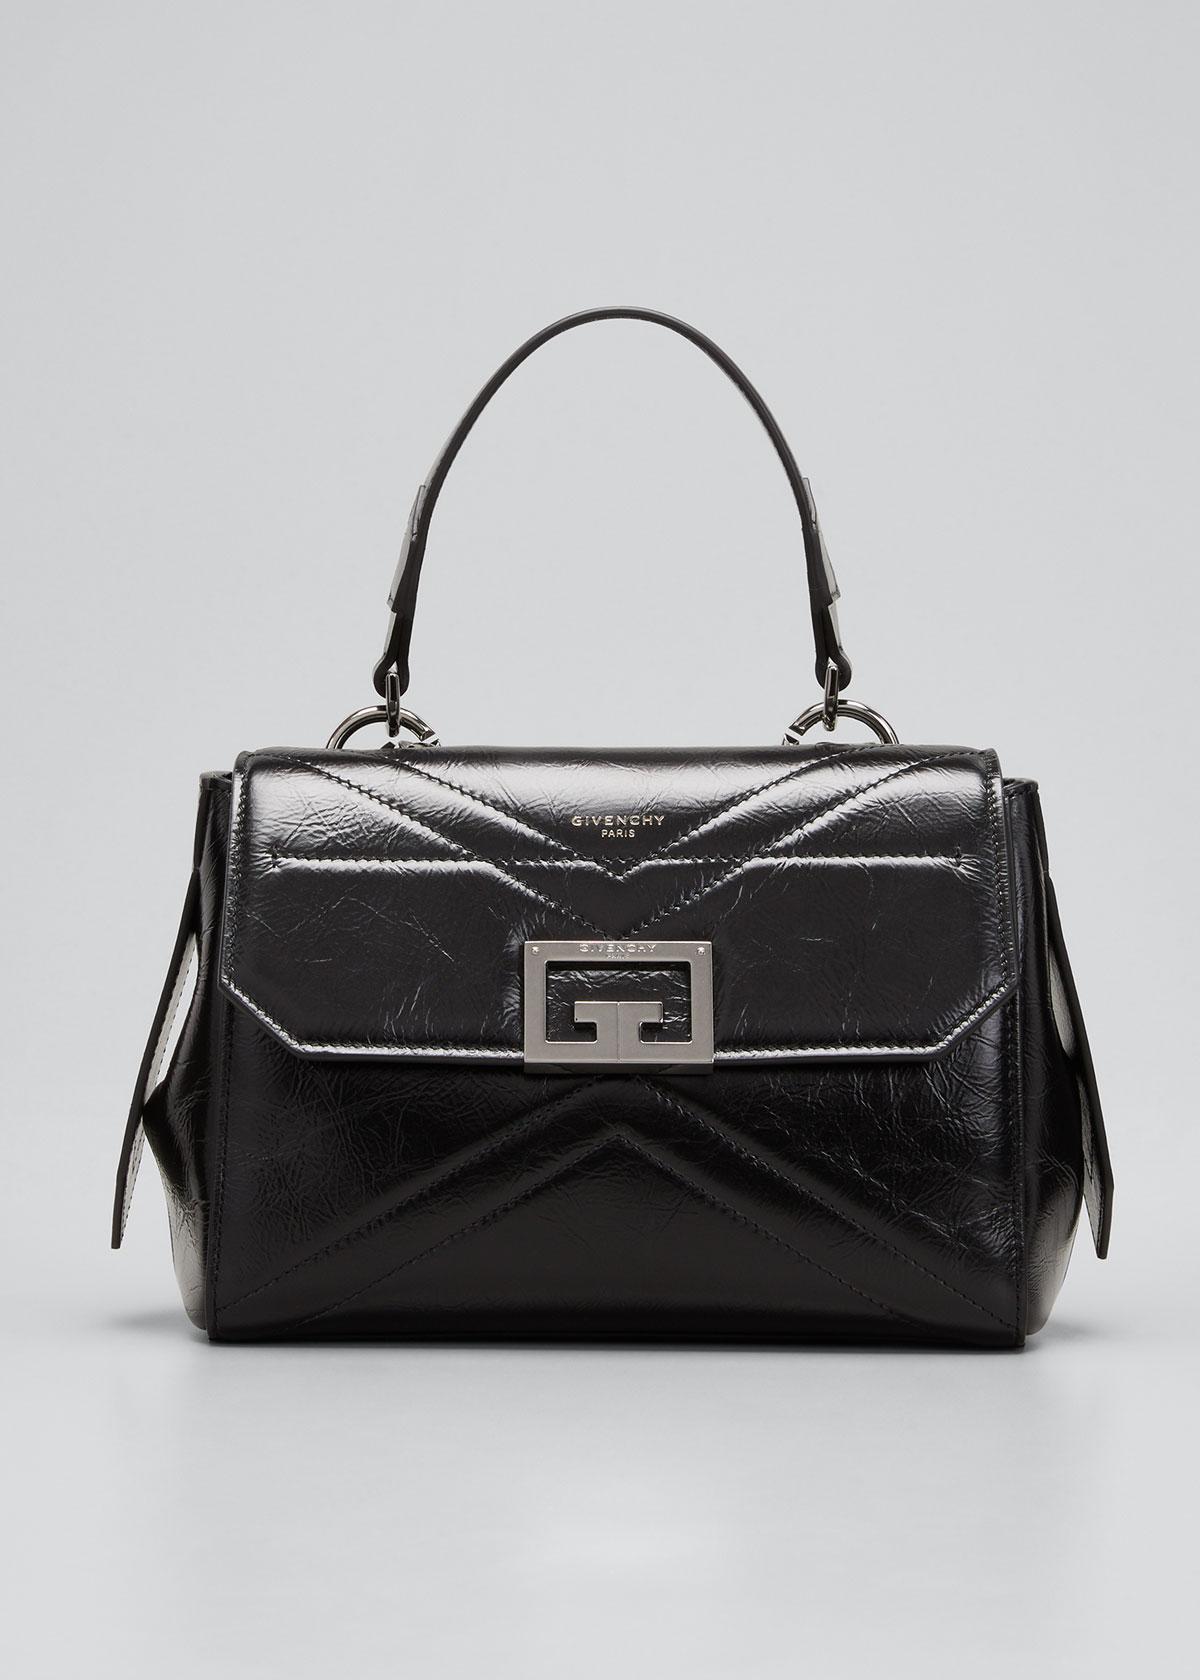 Givenchy ID SMALL VINTAGE CALF FLAP BAG